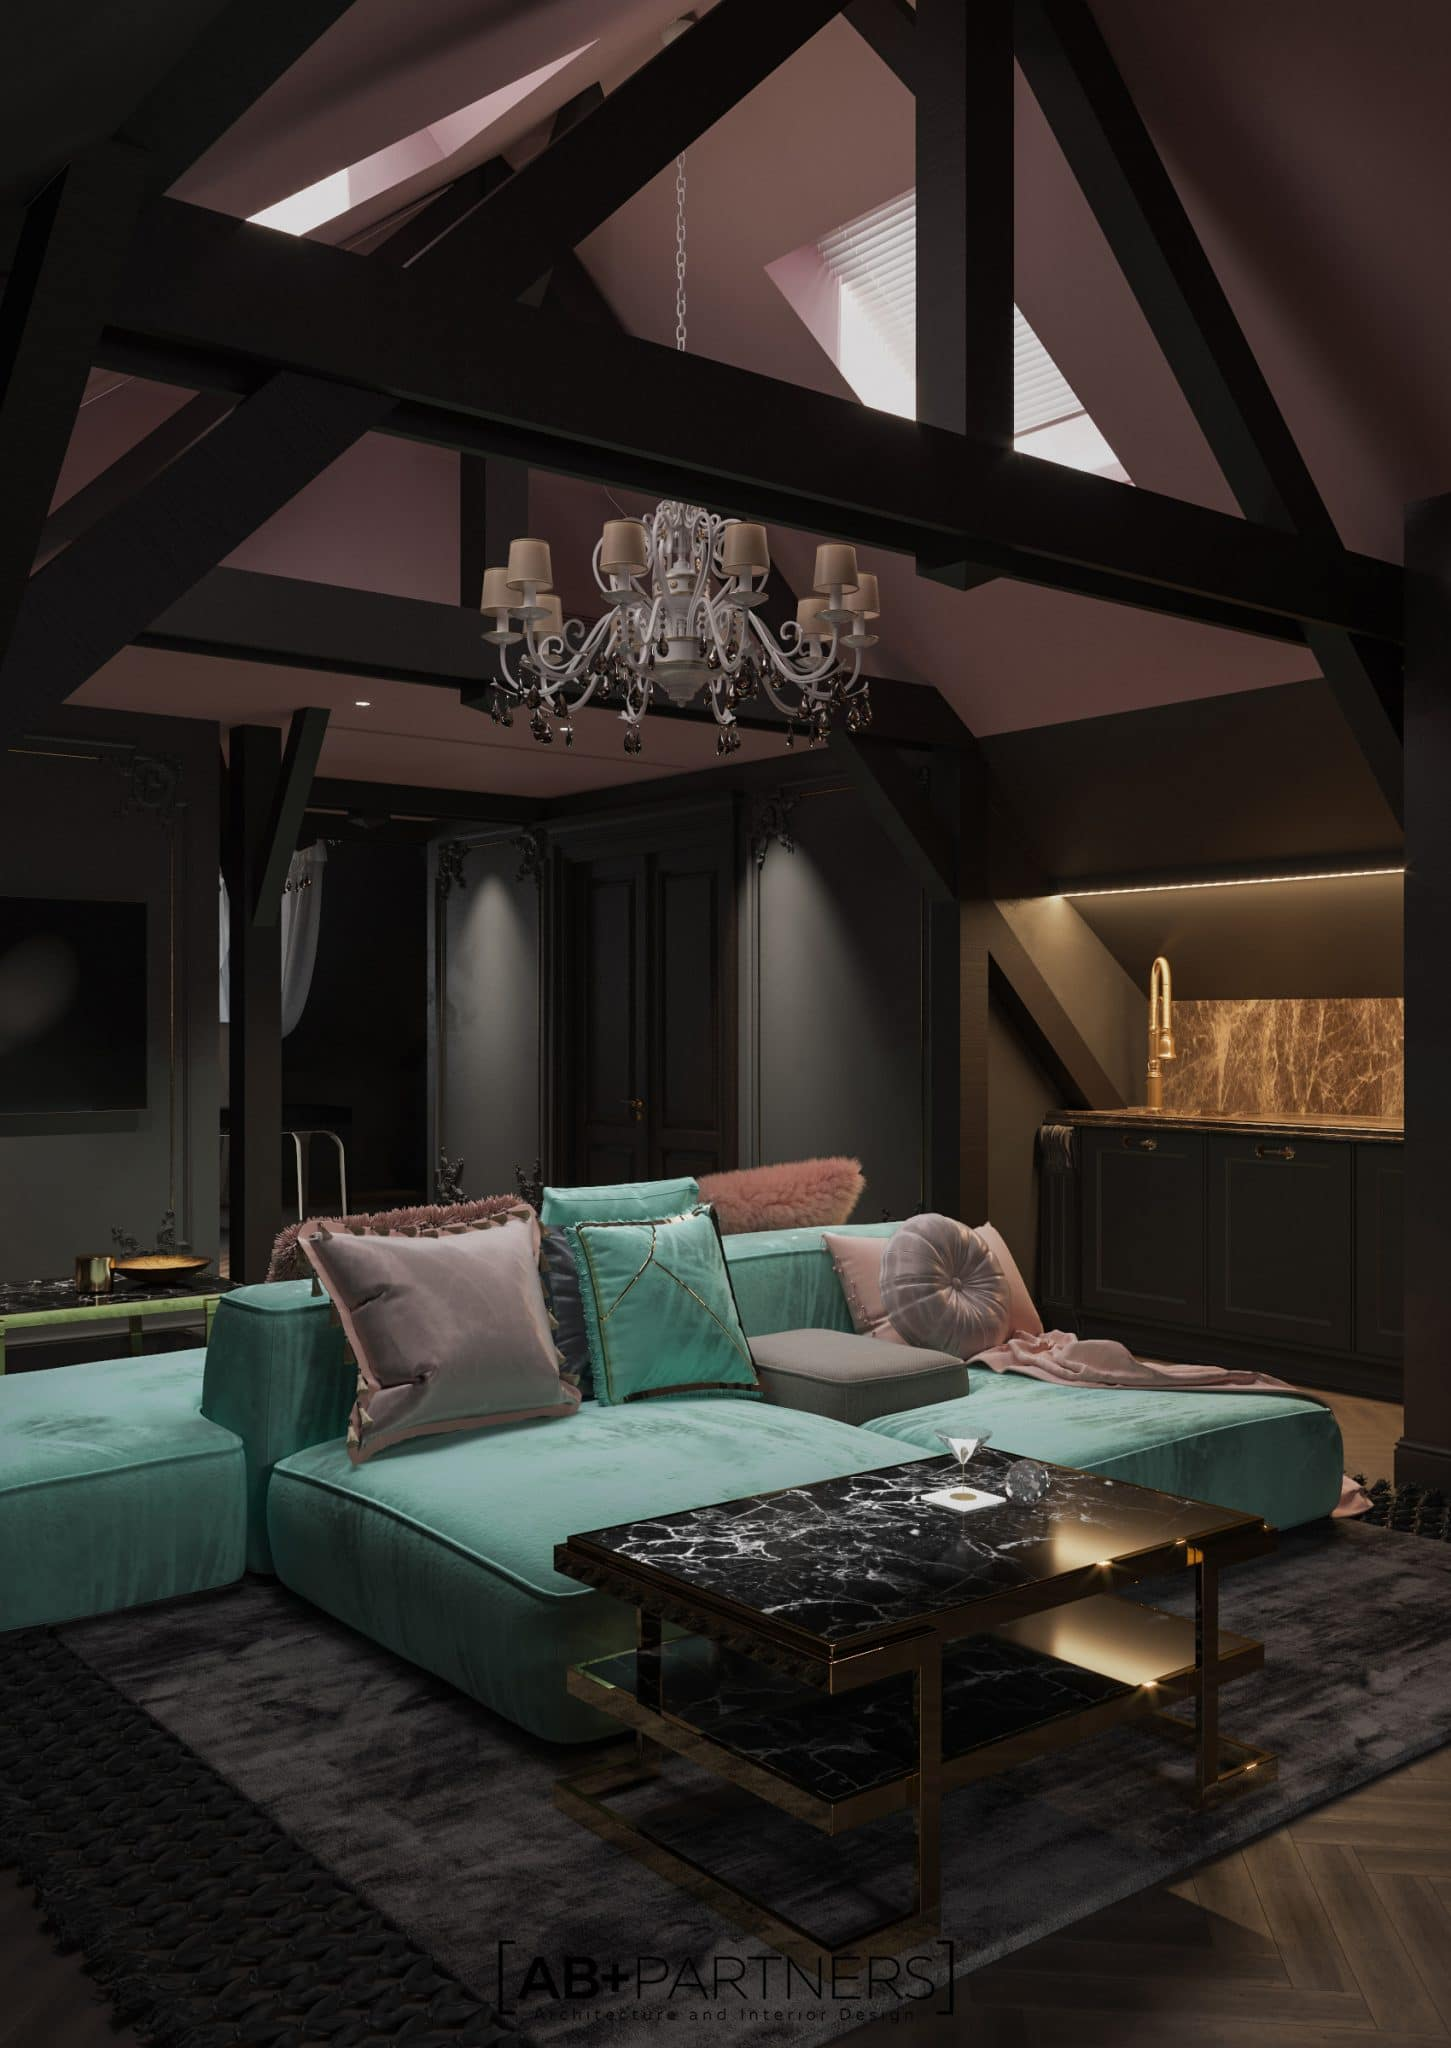 mansarda camera de living room in nuante de menta si roz, ab and partners